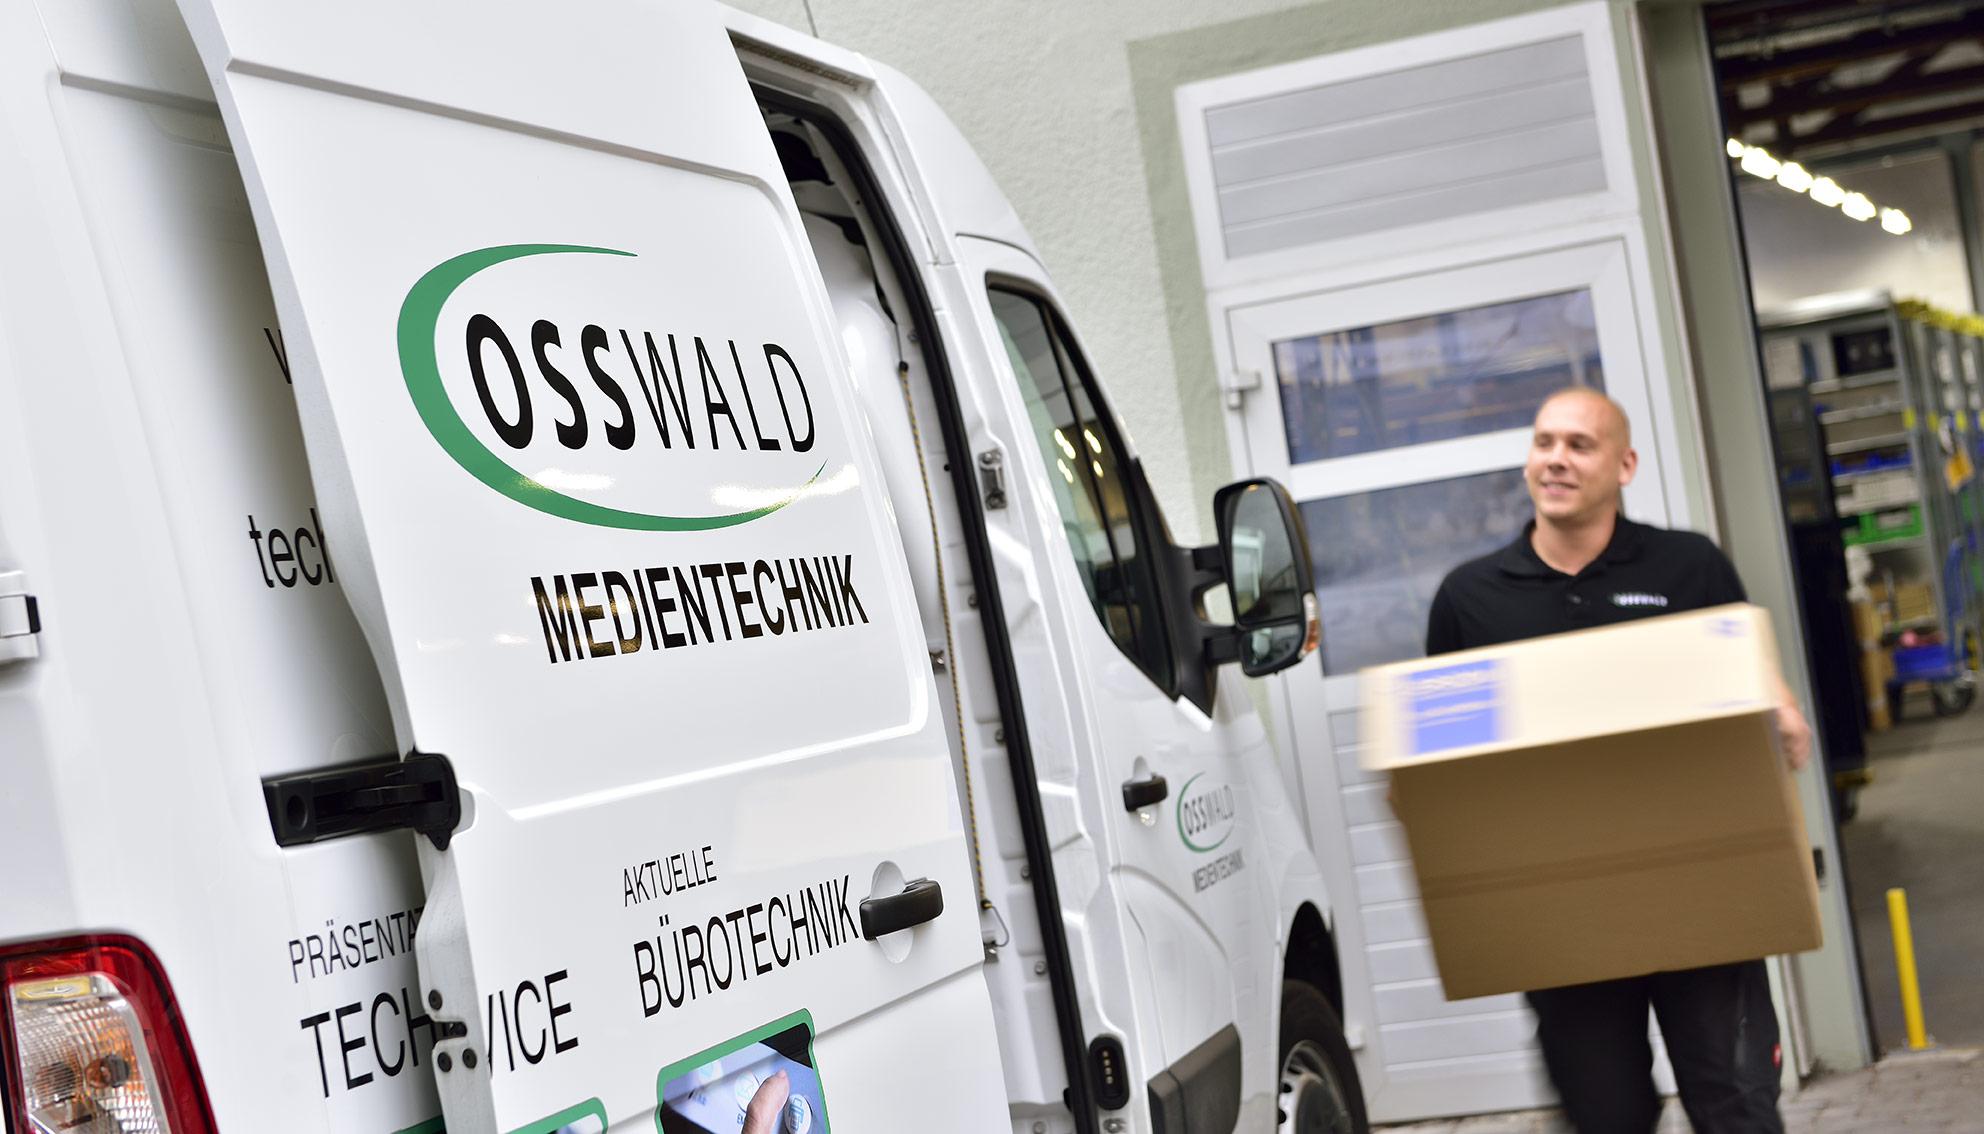 C Osswald Bürobedarf C Artikel Medientechnik Osswald